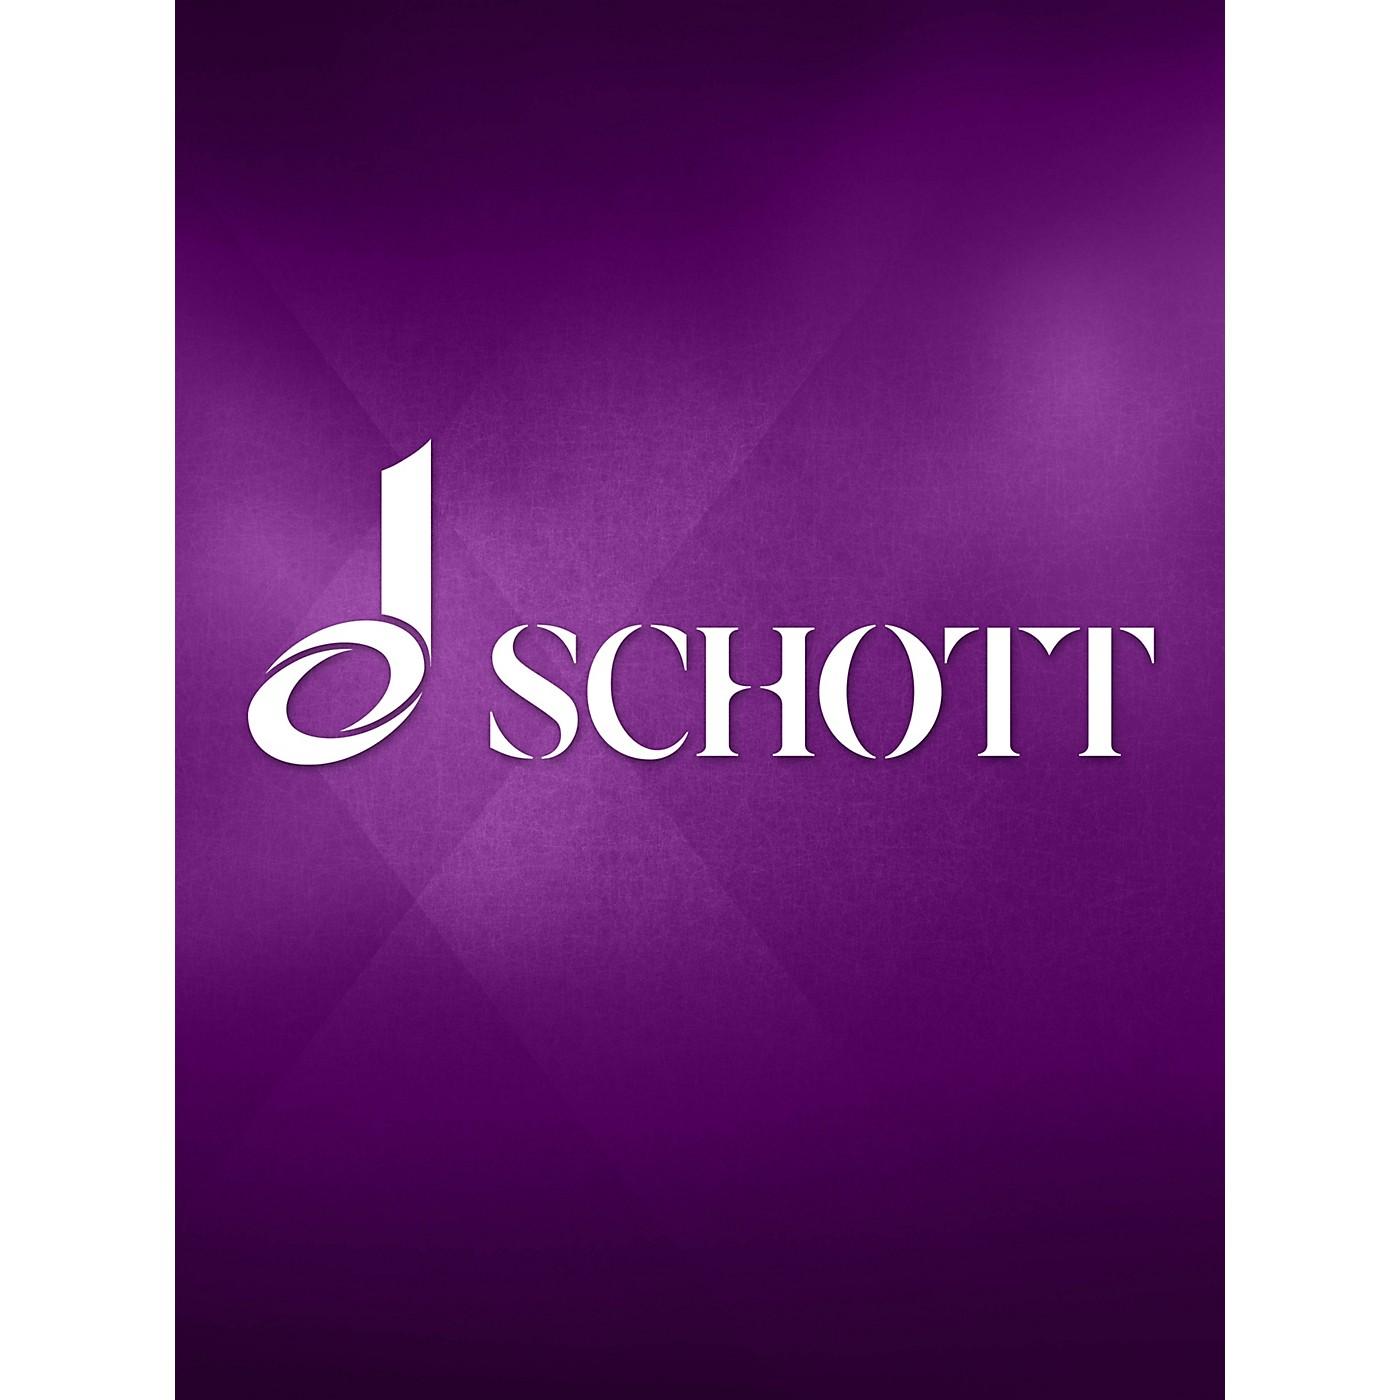 Schott 3 Fugues About BACH (Piano Solo) Schott Series thumbnail